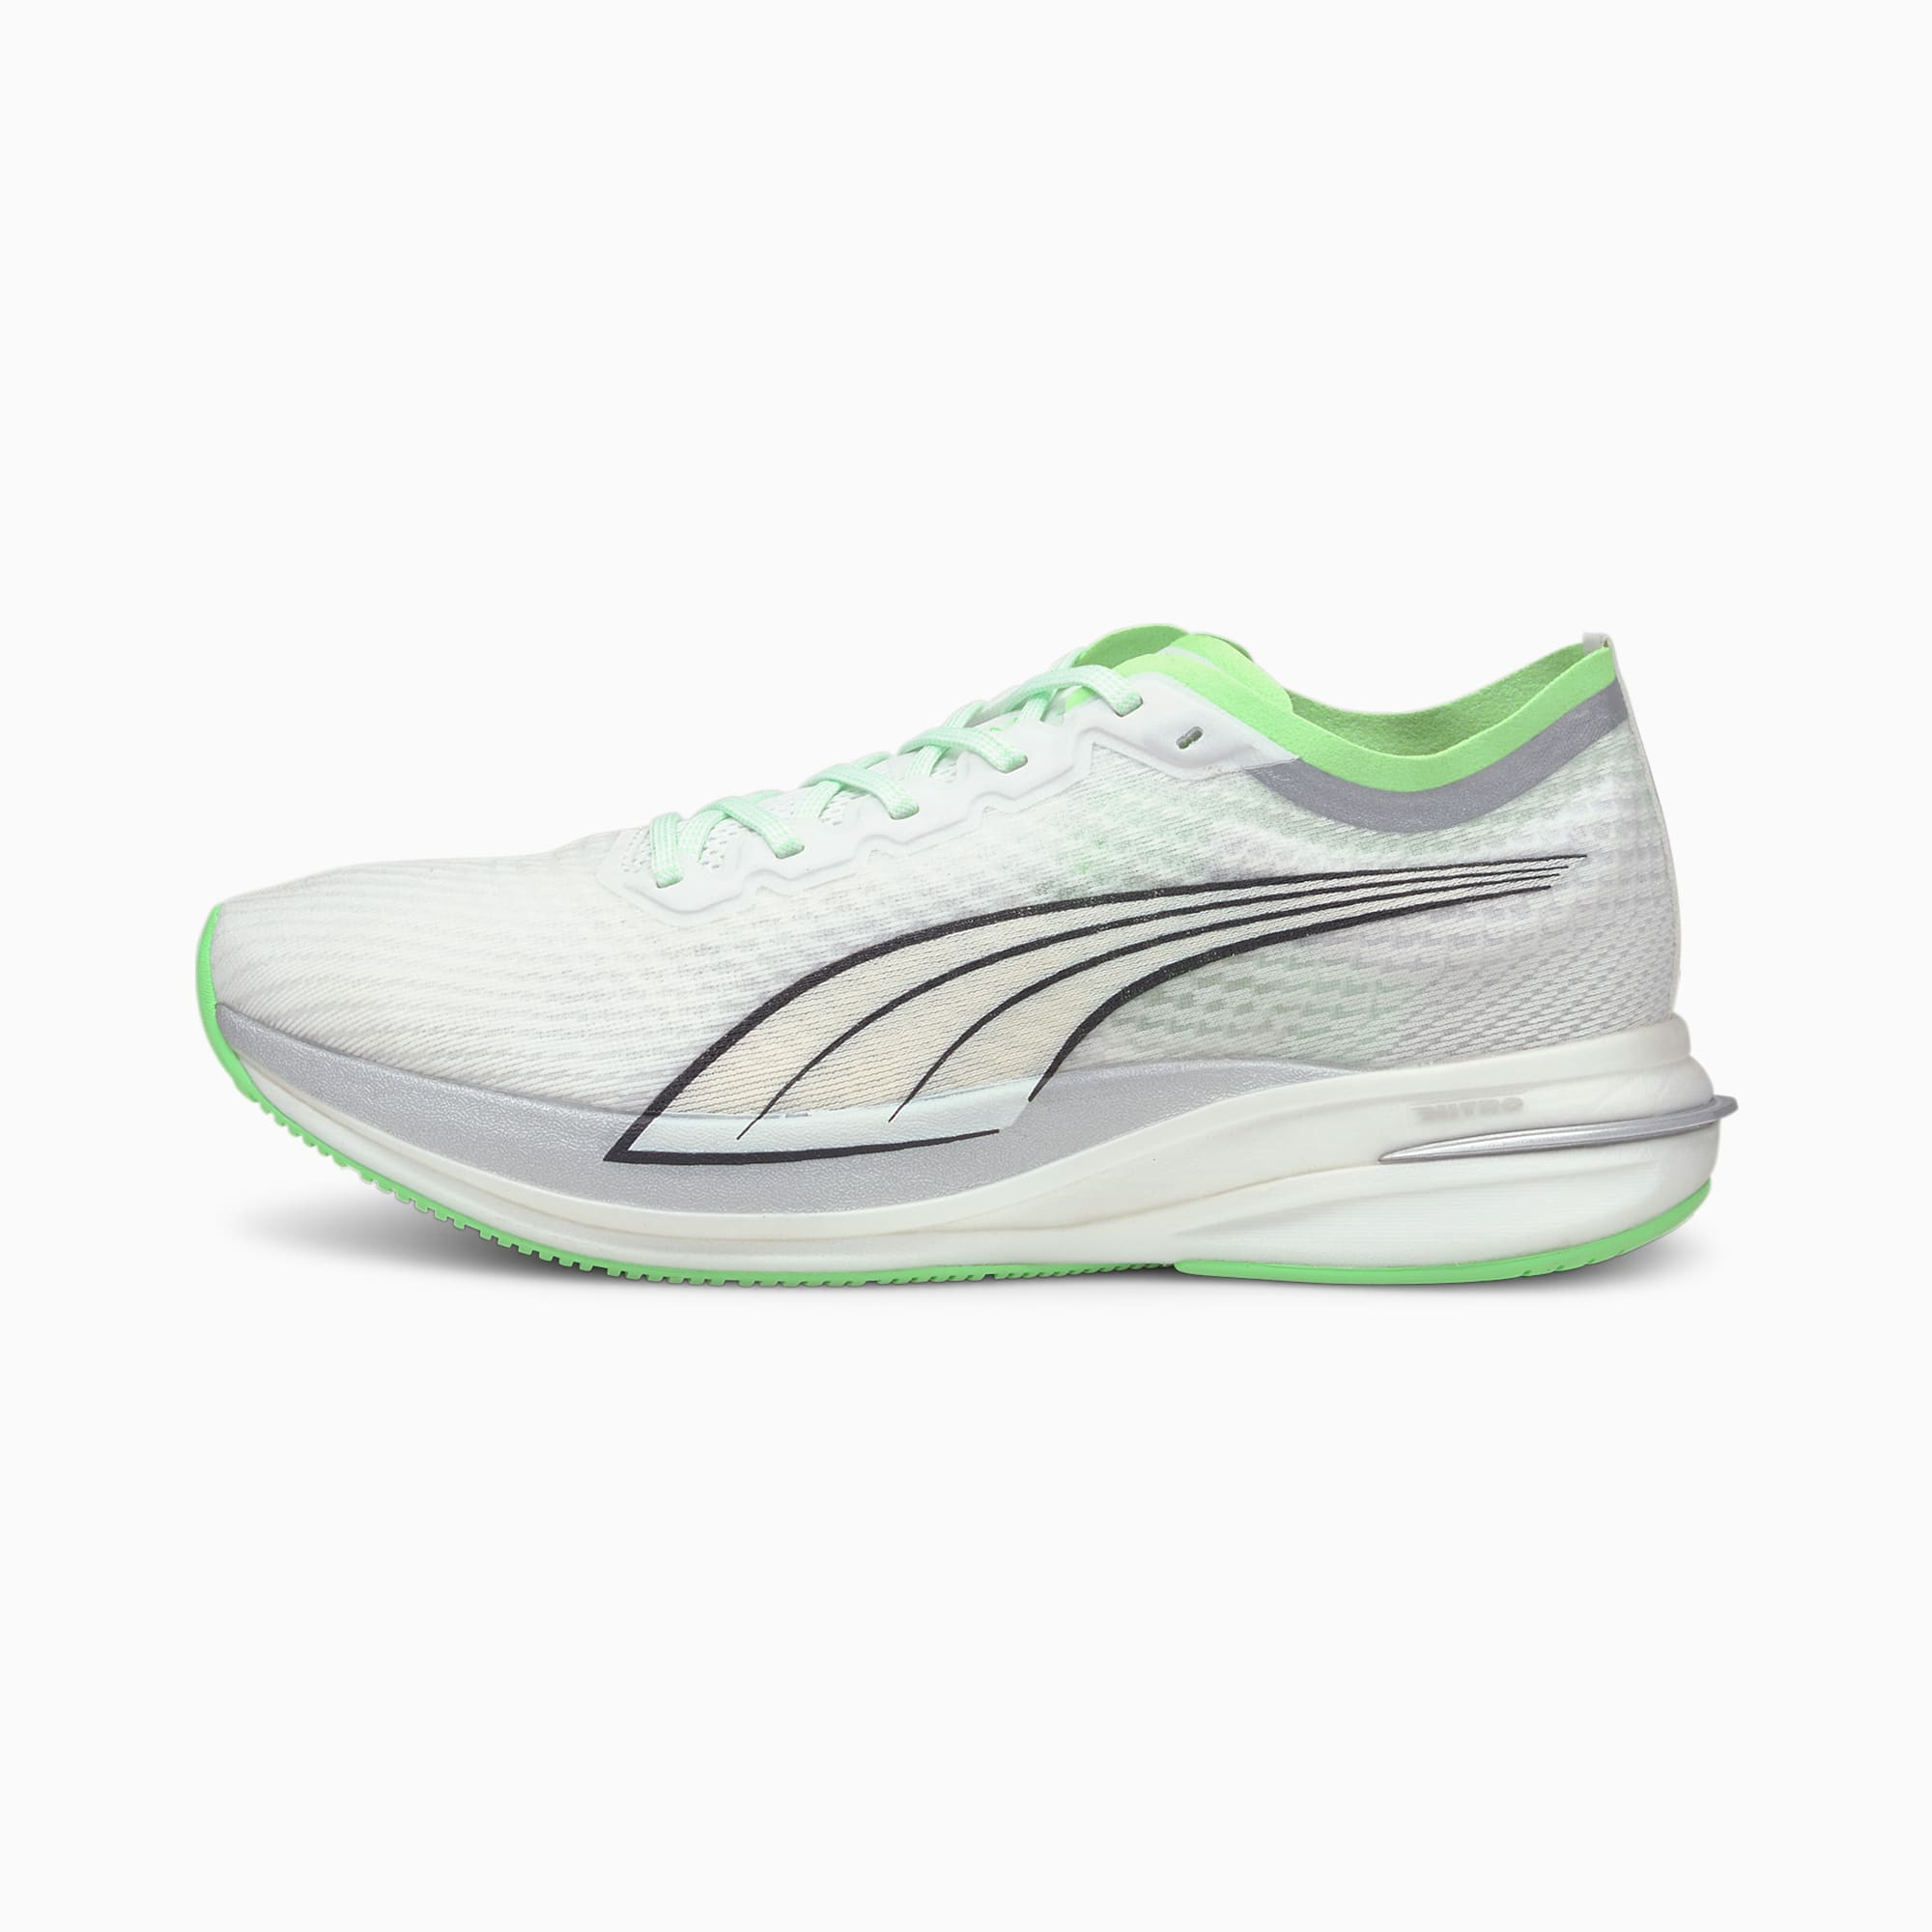 Deviate NITRO COOLadapt Men's Running Shoes